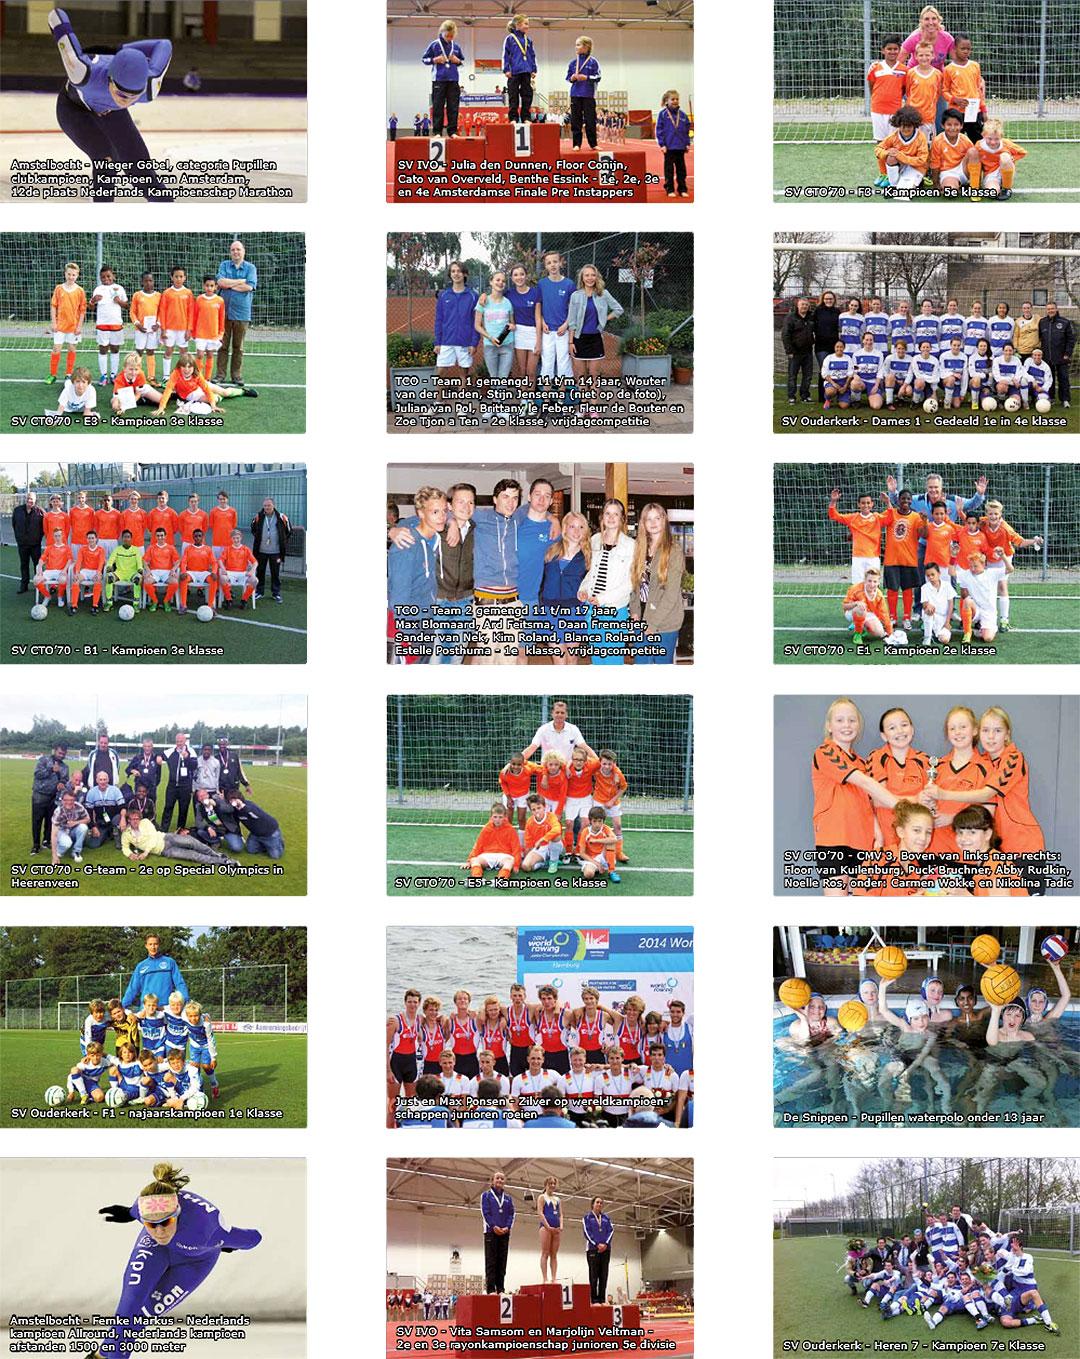 Poster sportkampioenen 2013-2014 Ouder-Amstel